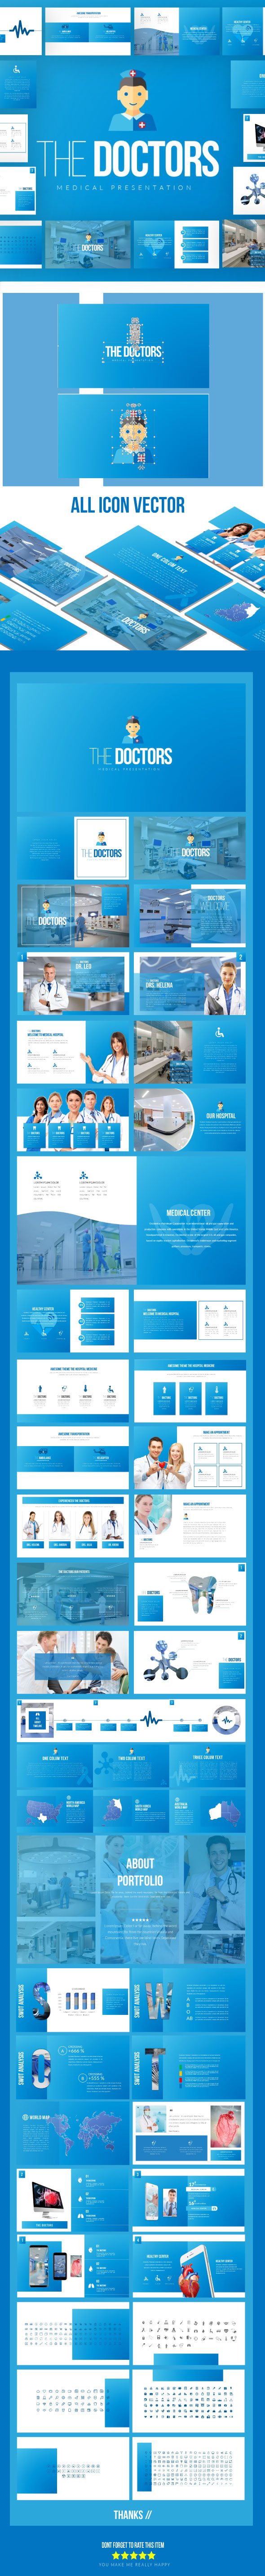 The Doctors - Multipurpose Presentation Templates - PowerPoint Templates Presentation Templates